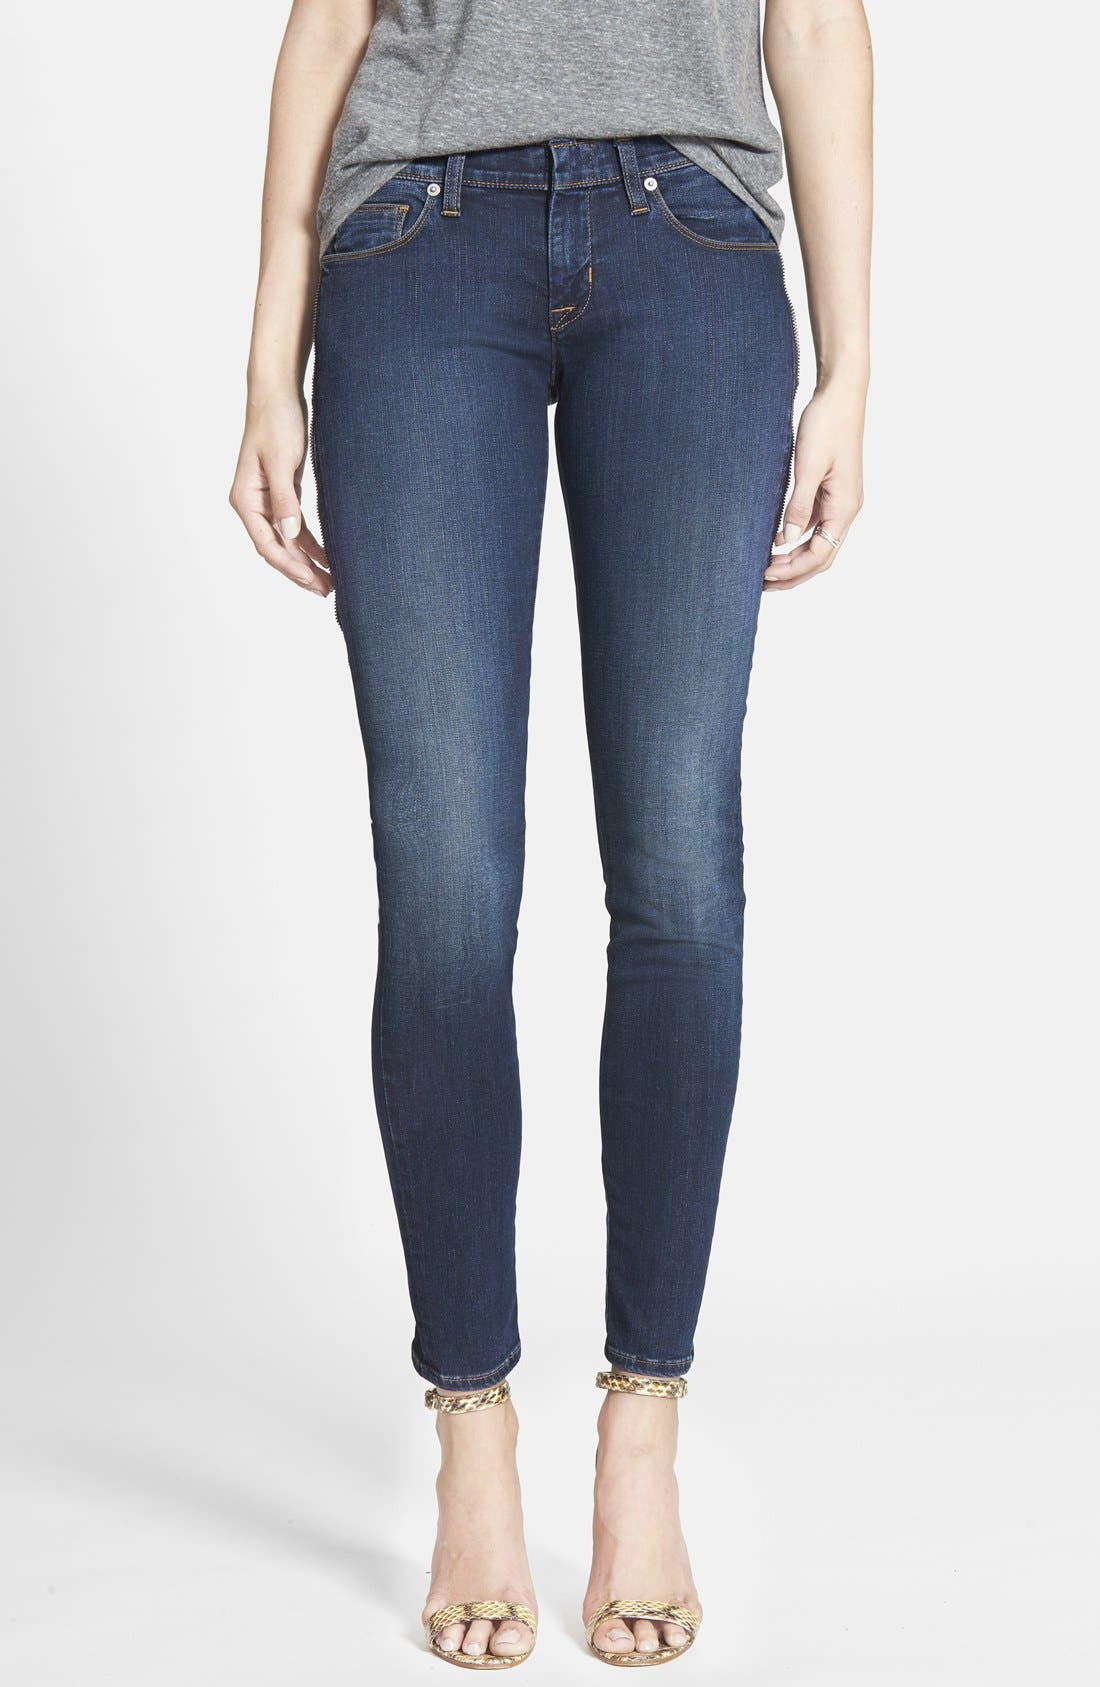 Alternate Image 1 Selected - Hudson Jeans 'Spirit Punk' Zip Detail Skinny Jeans (Globetrotter)